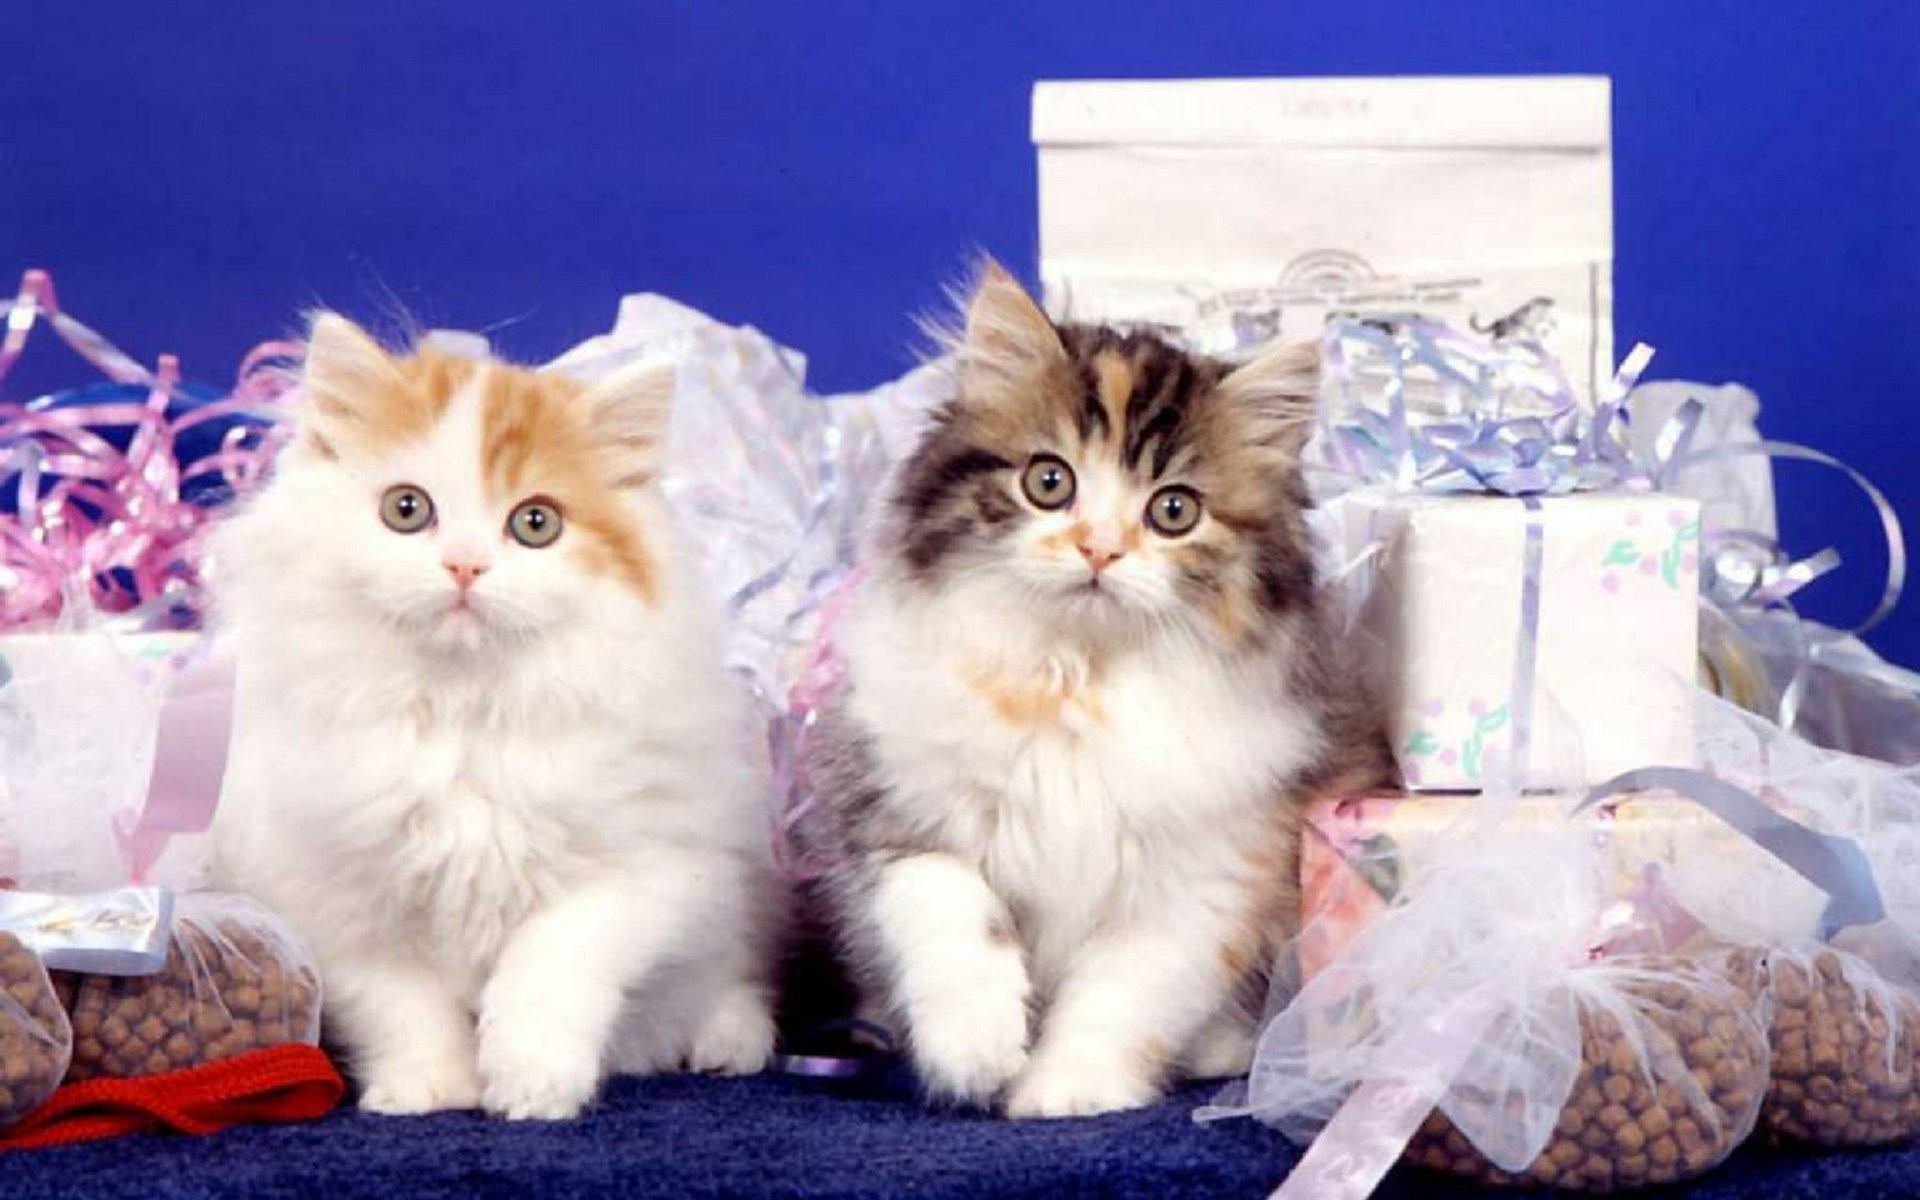 Для, открытки или фото с кошками